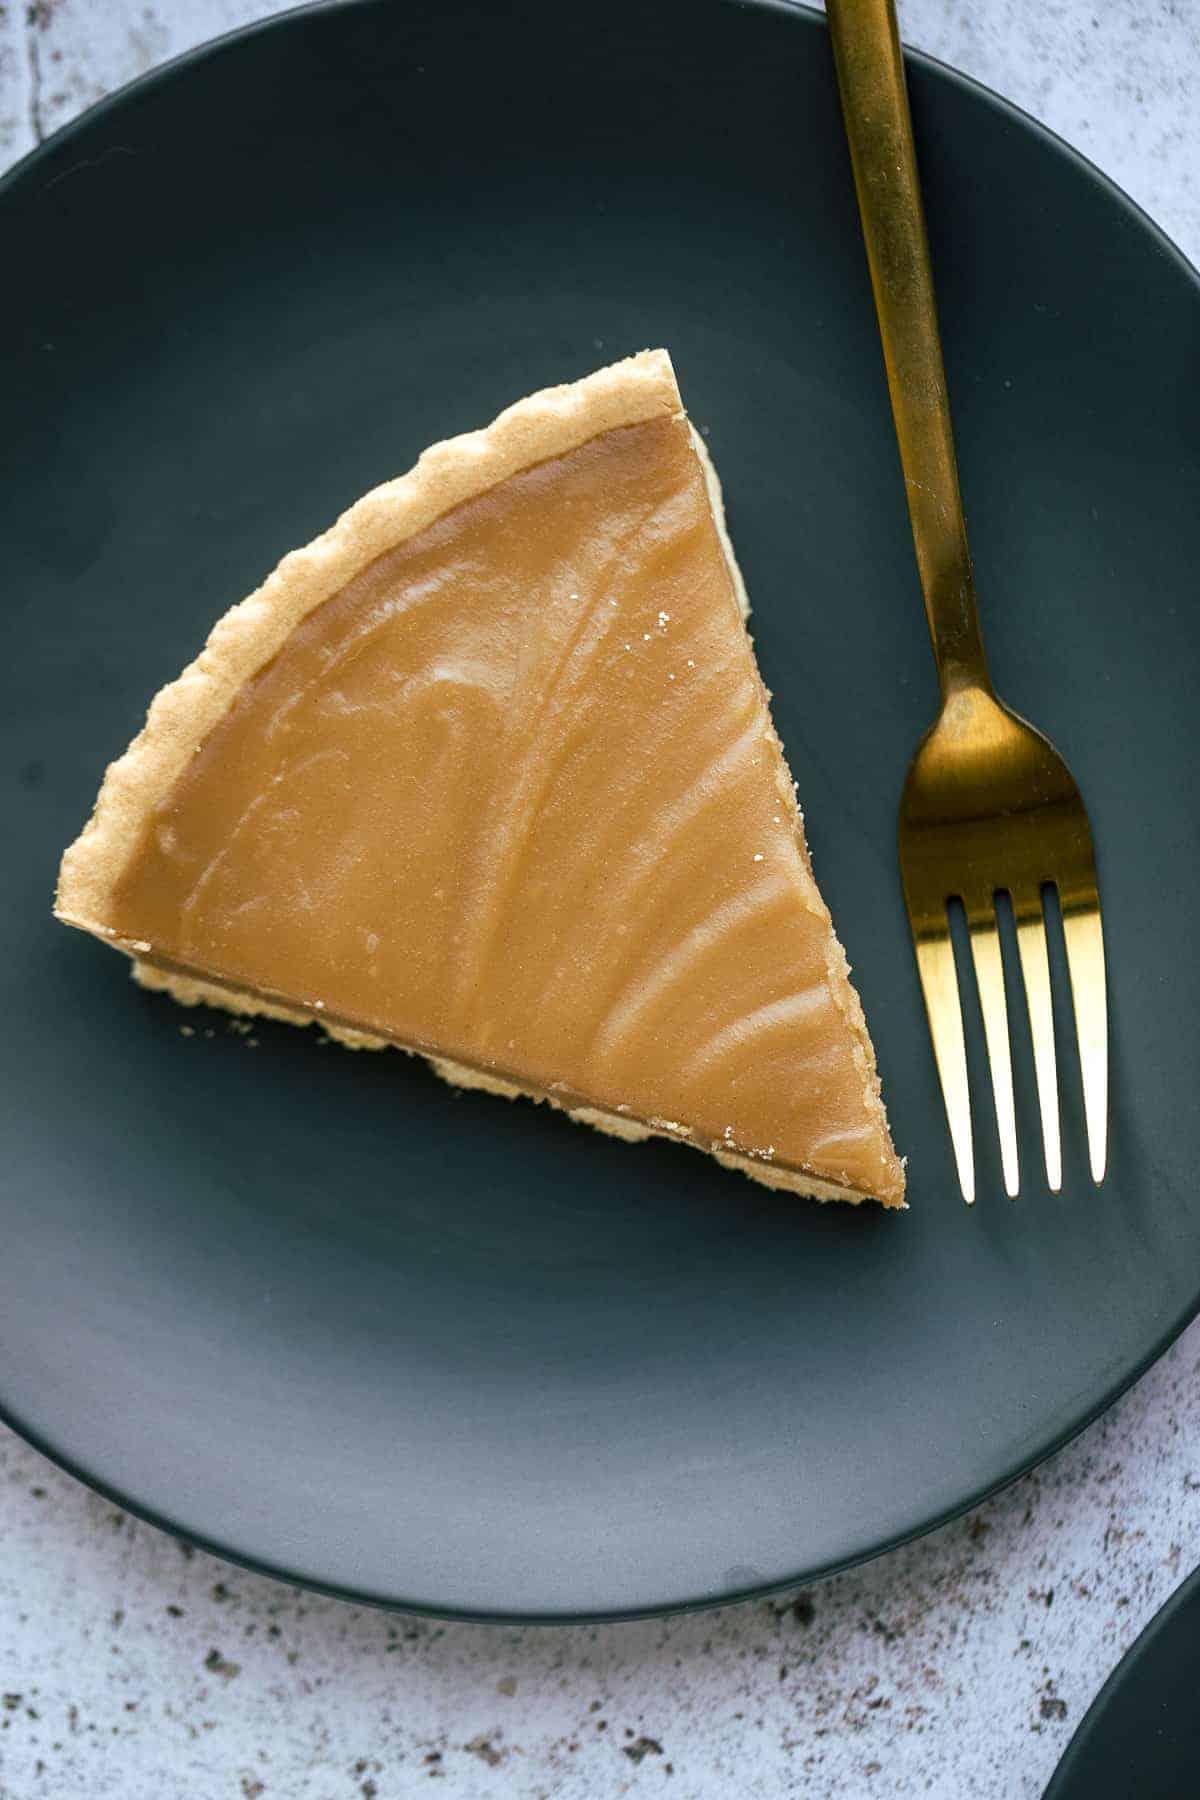 A single slice of a caramel tart.